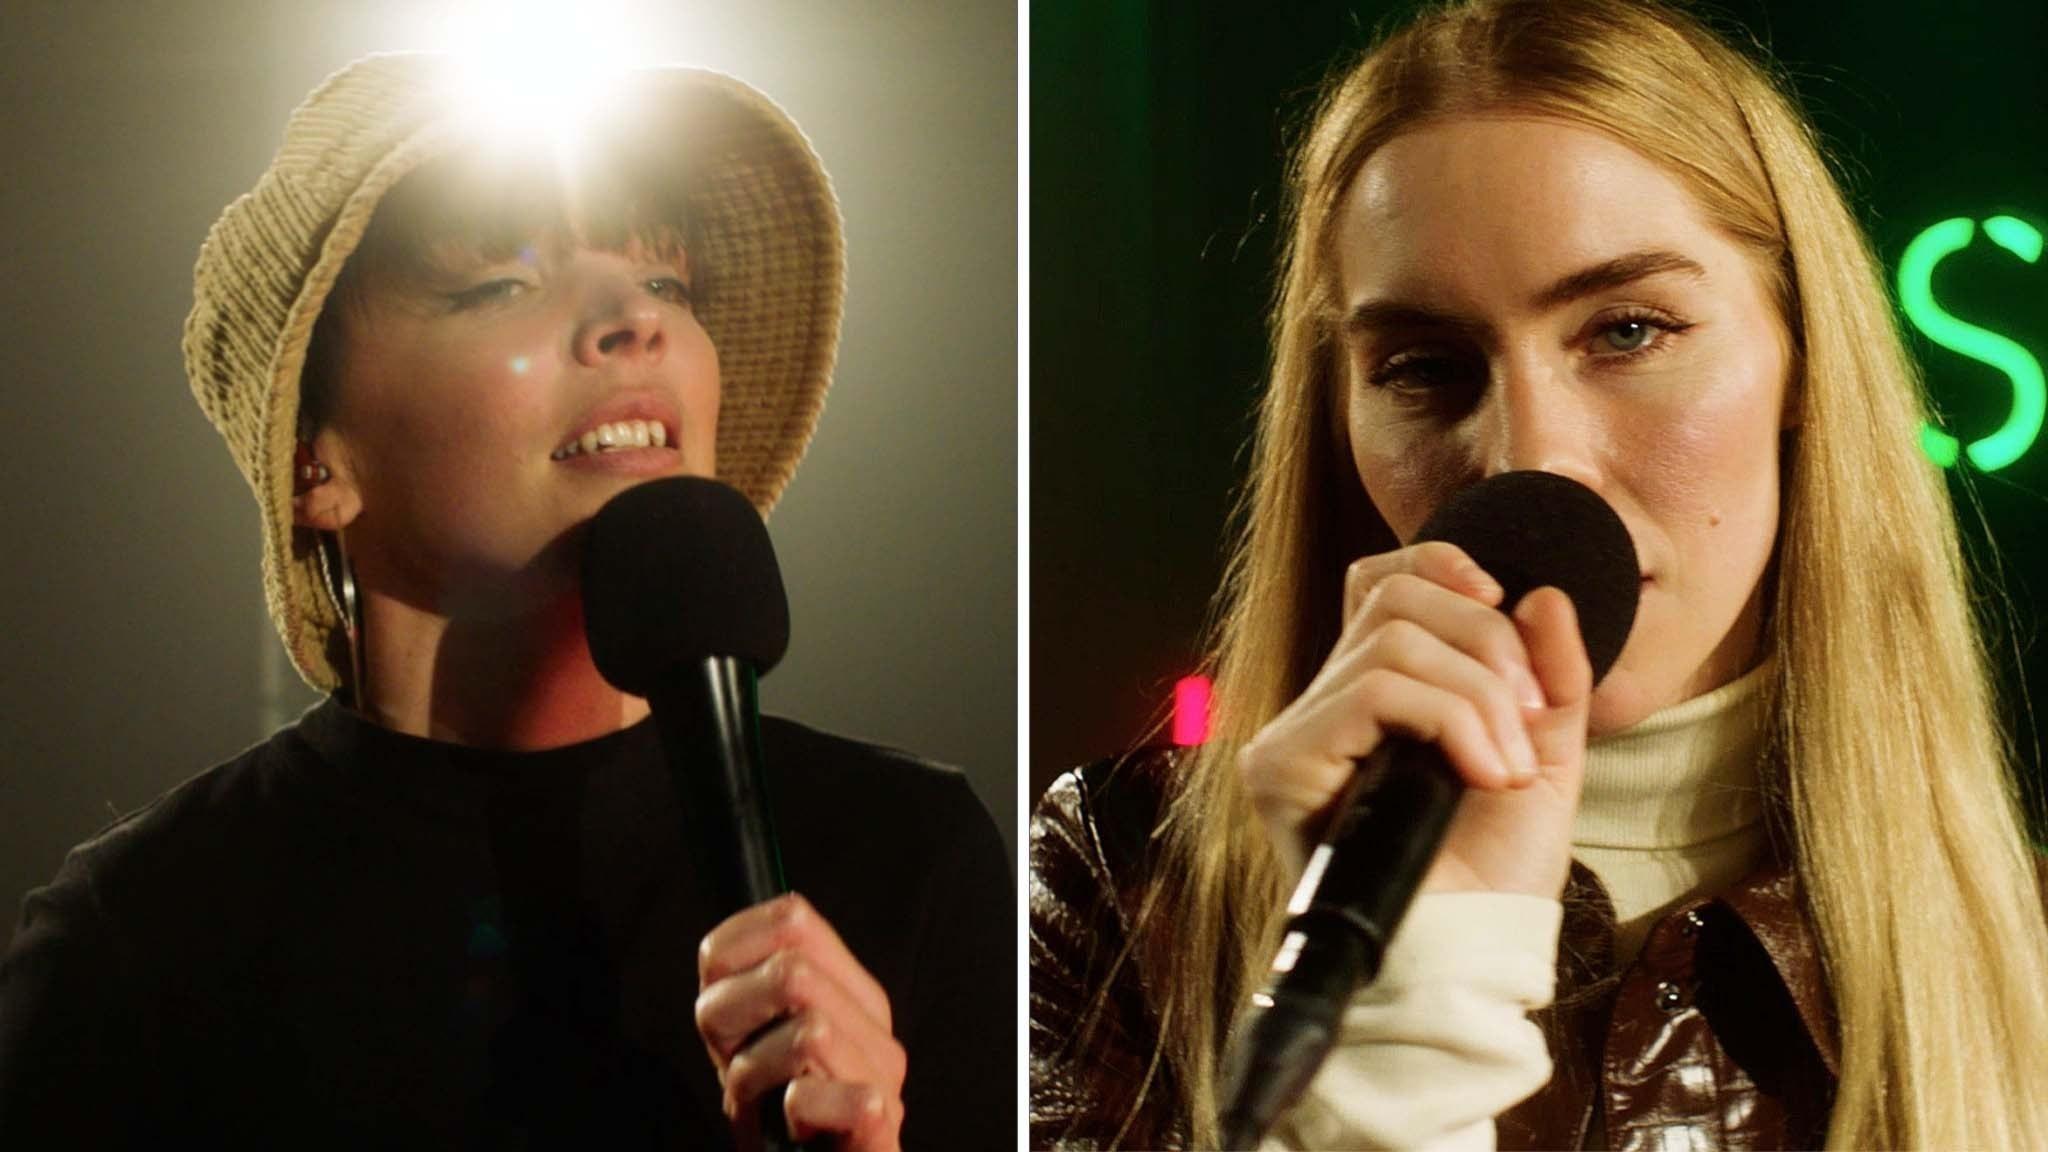 Nea & SHY Martin sjunger på P3 Sessions gröna scen